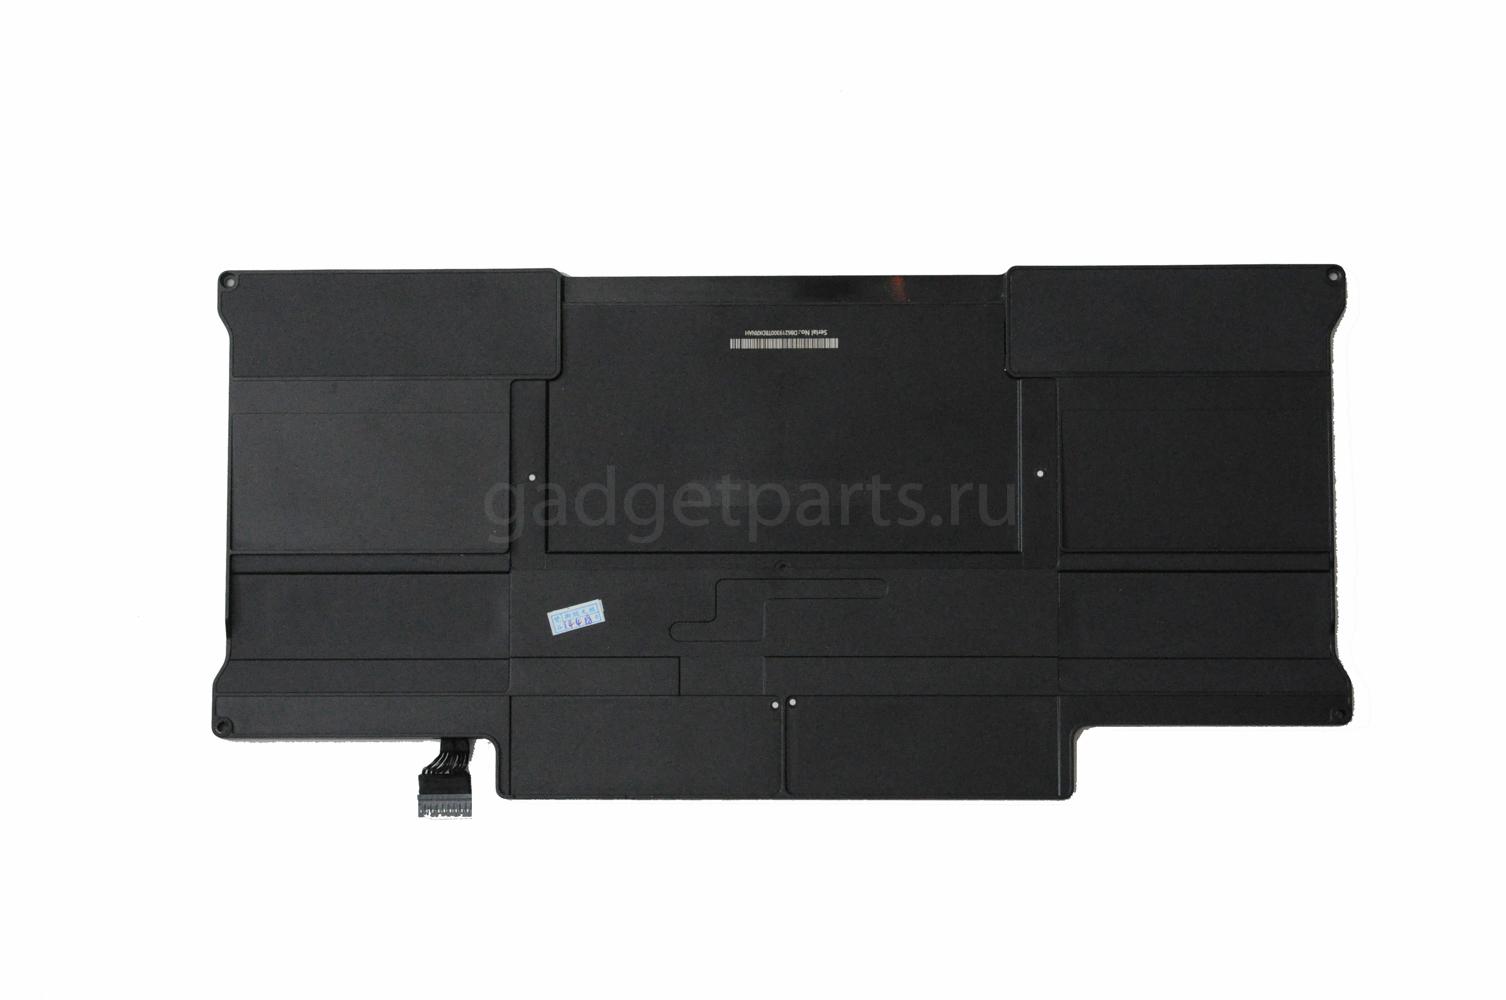 Аккумулятор MacBook Air 13 A1466 2011-2012 года